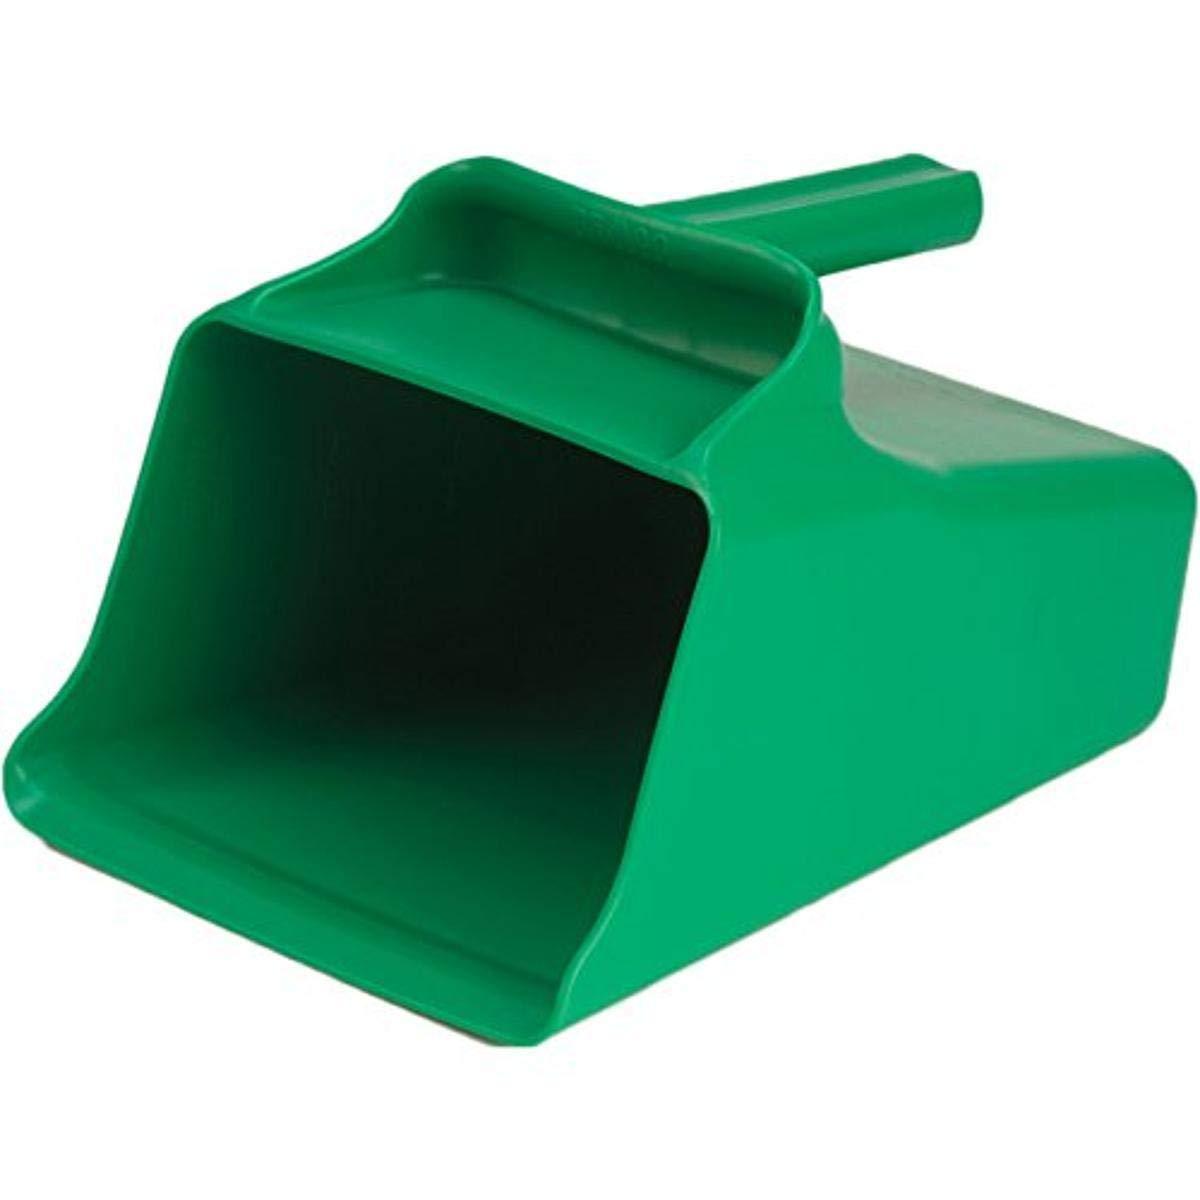 Remco 65502 Green Polypropylene Injection Molded Color-Coded Bowl Mega Scoop, 128 oz, 1 Piece